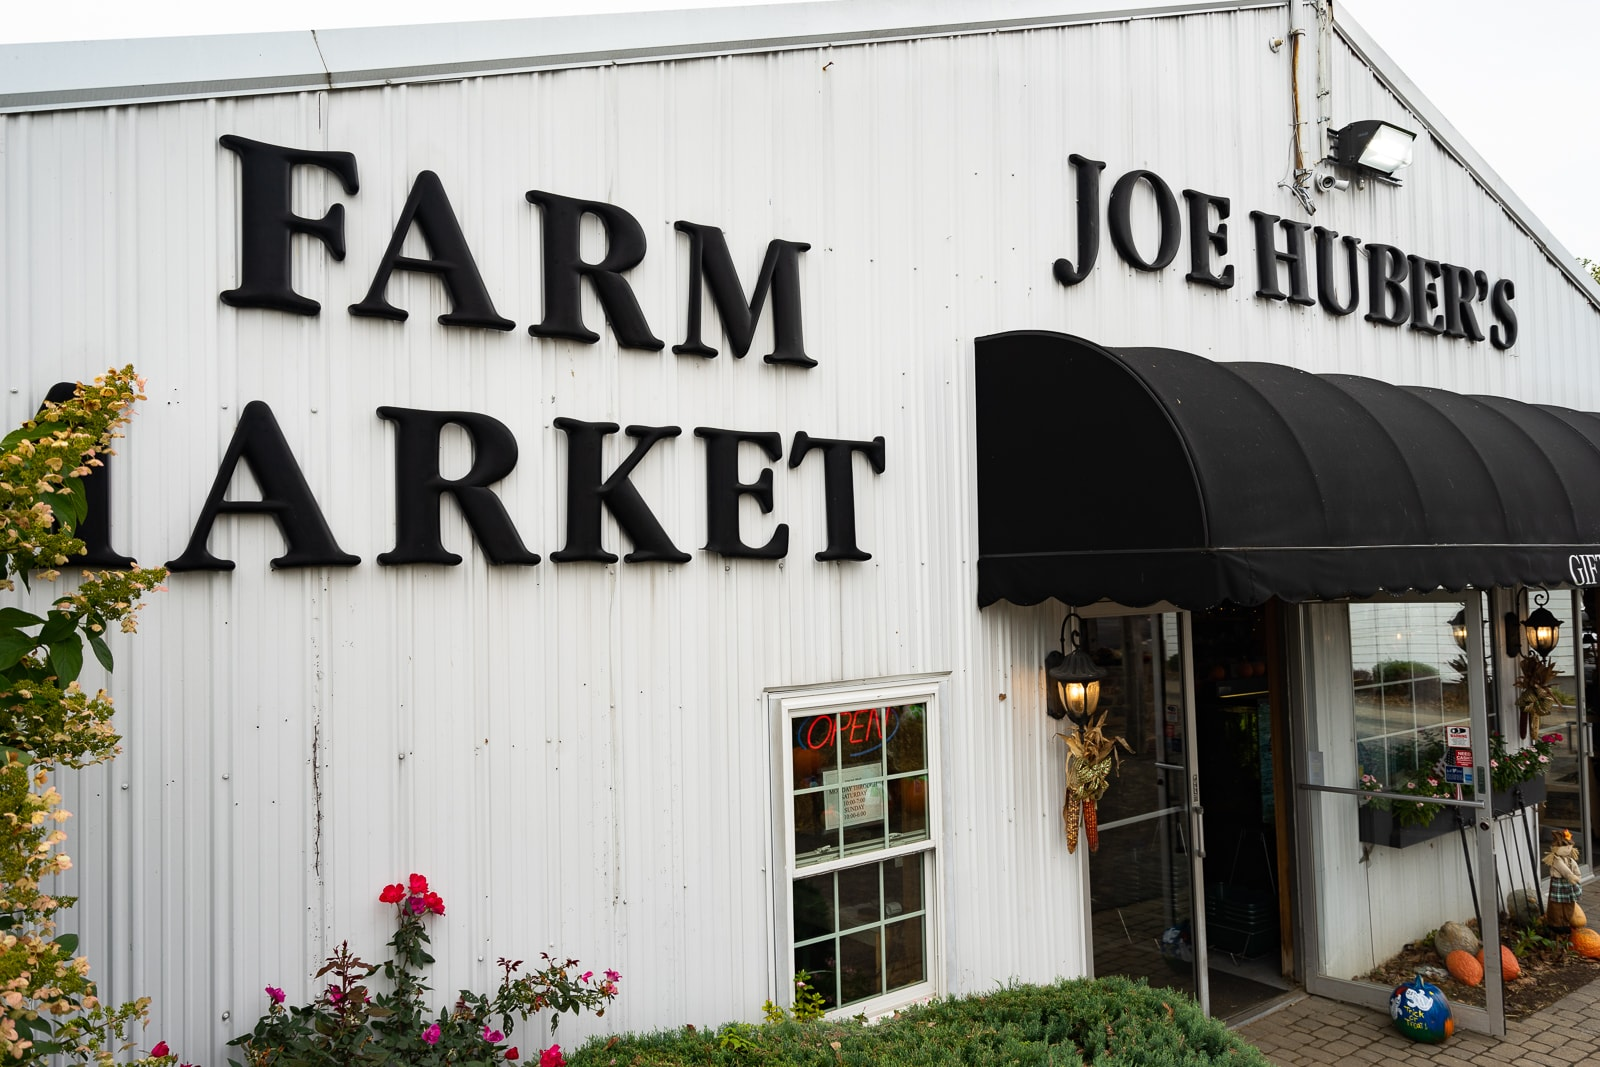 111718-Joe-Hubers-Restaurant-5